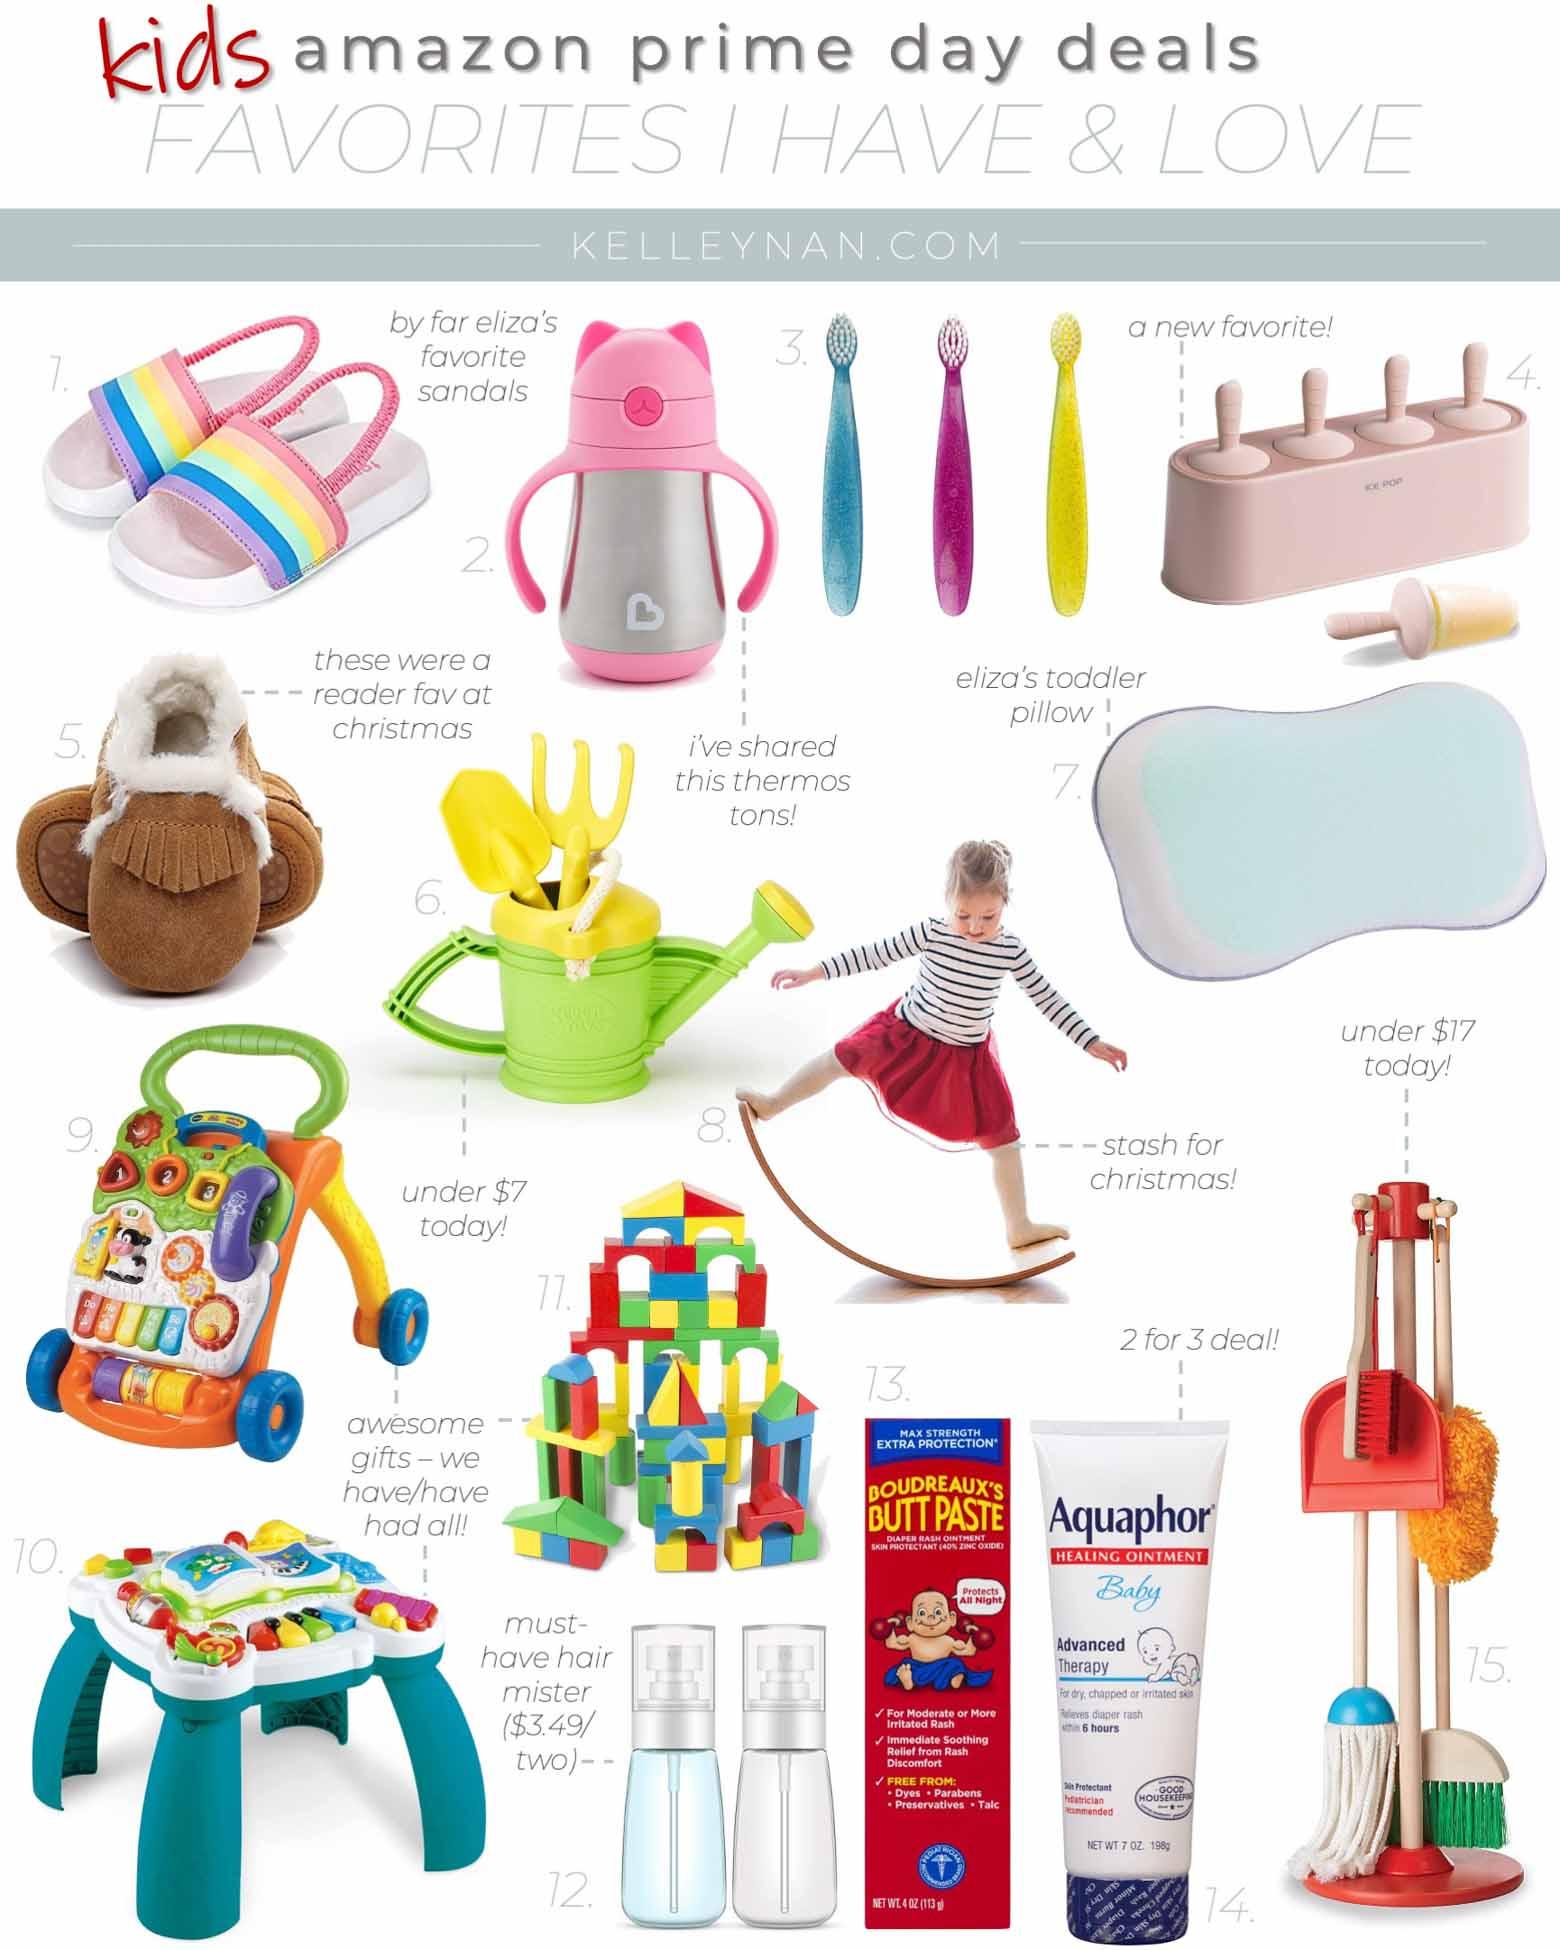 Amazon Prime Day Favorites for Kids